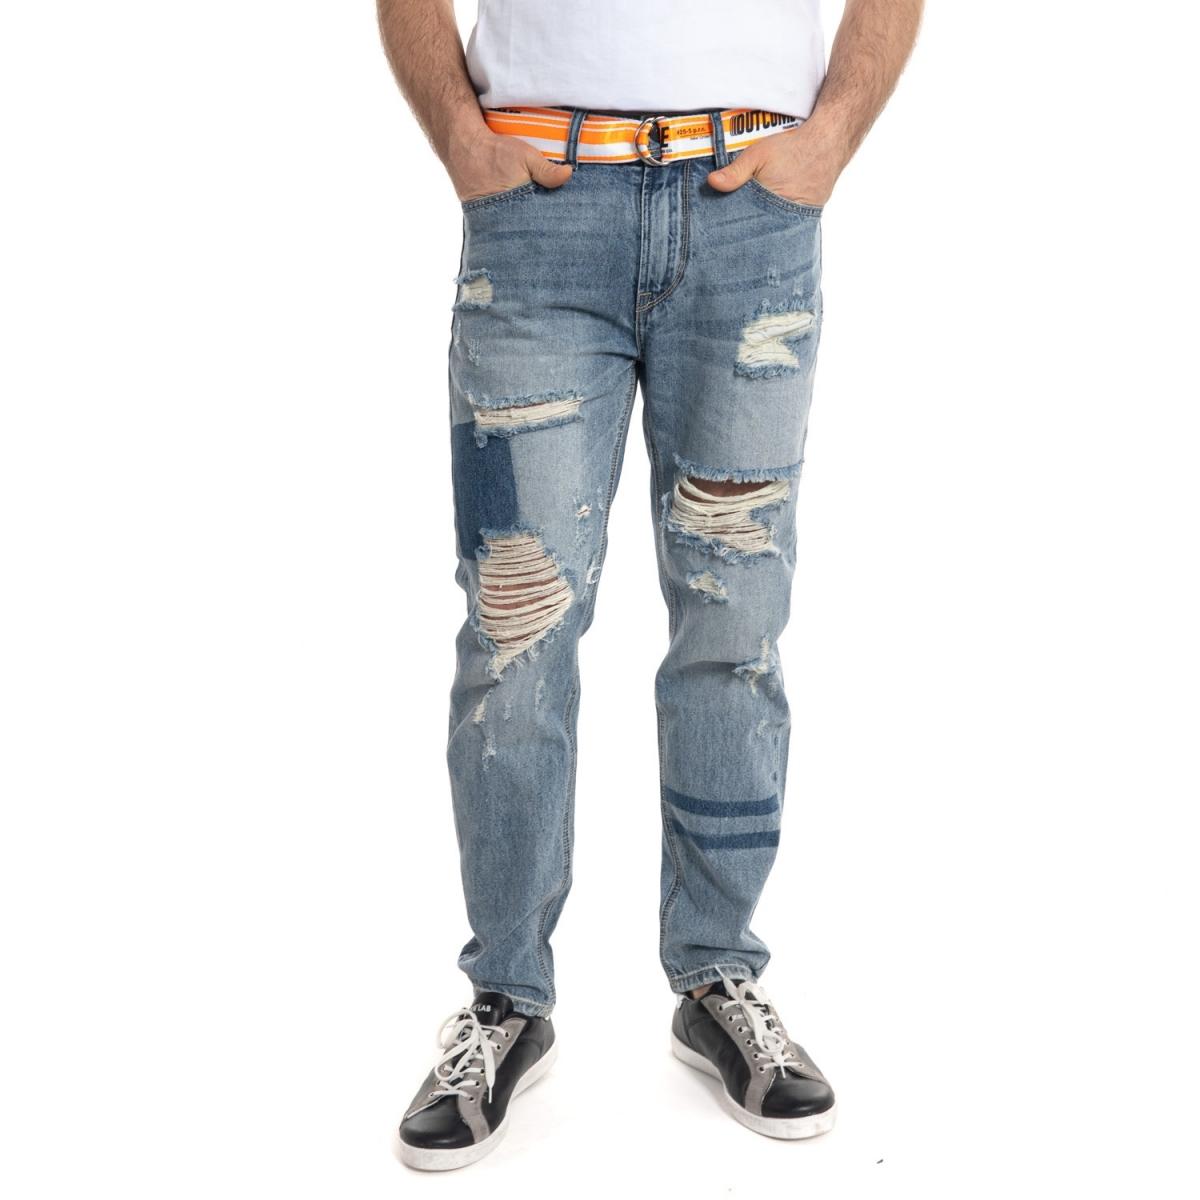 clothing Denim men Jeans GLOT691Y GIANNI LUPO Cafedelmar Shop